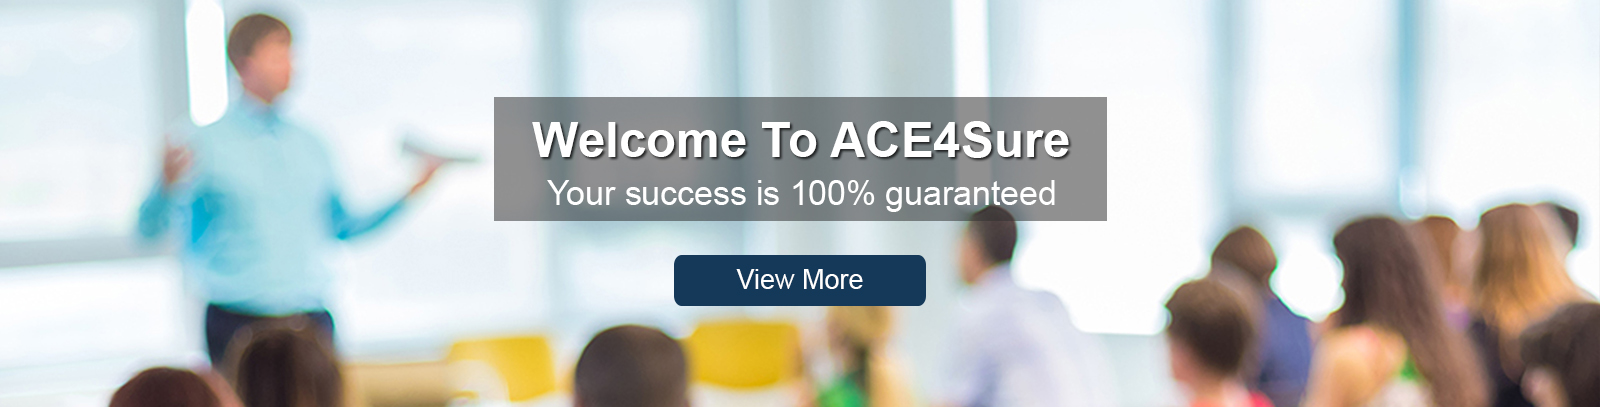 ace4sure slider